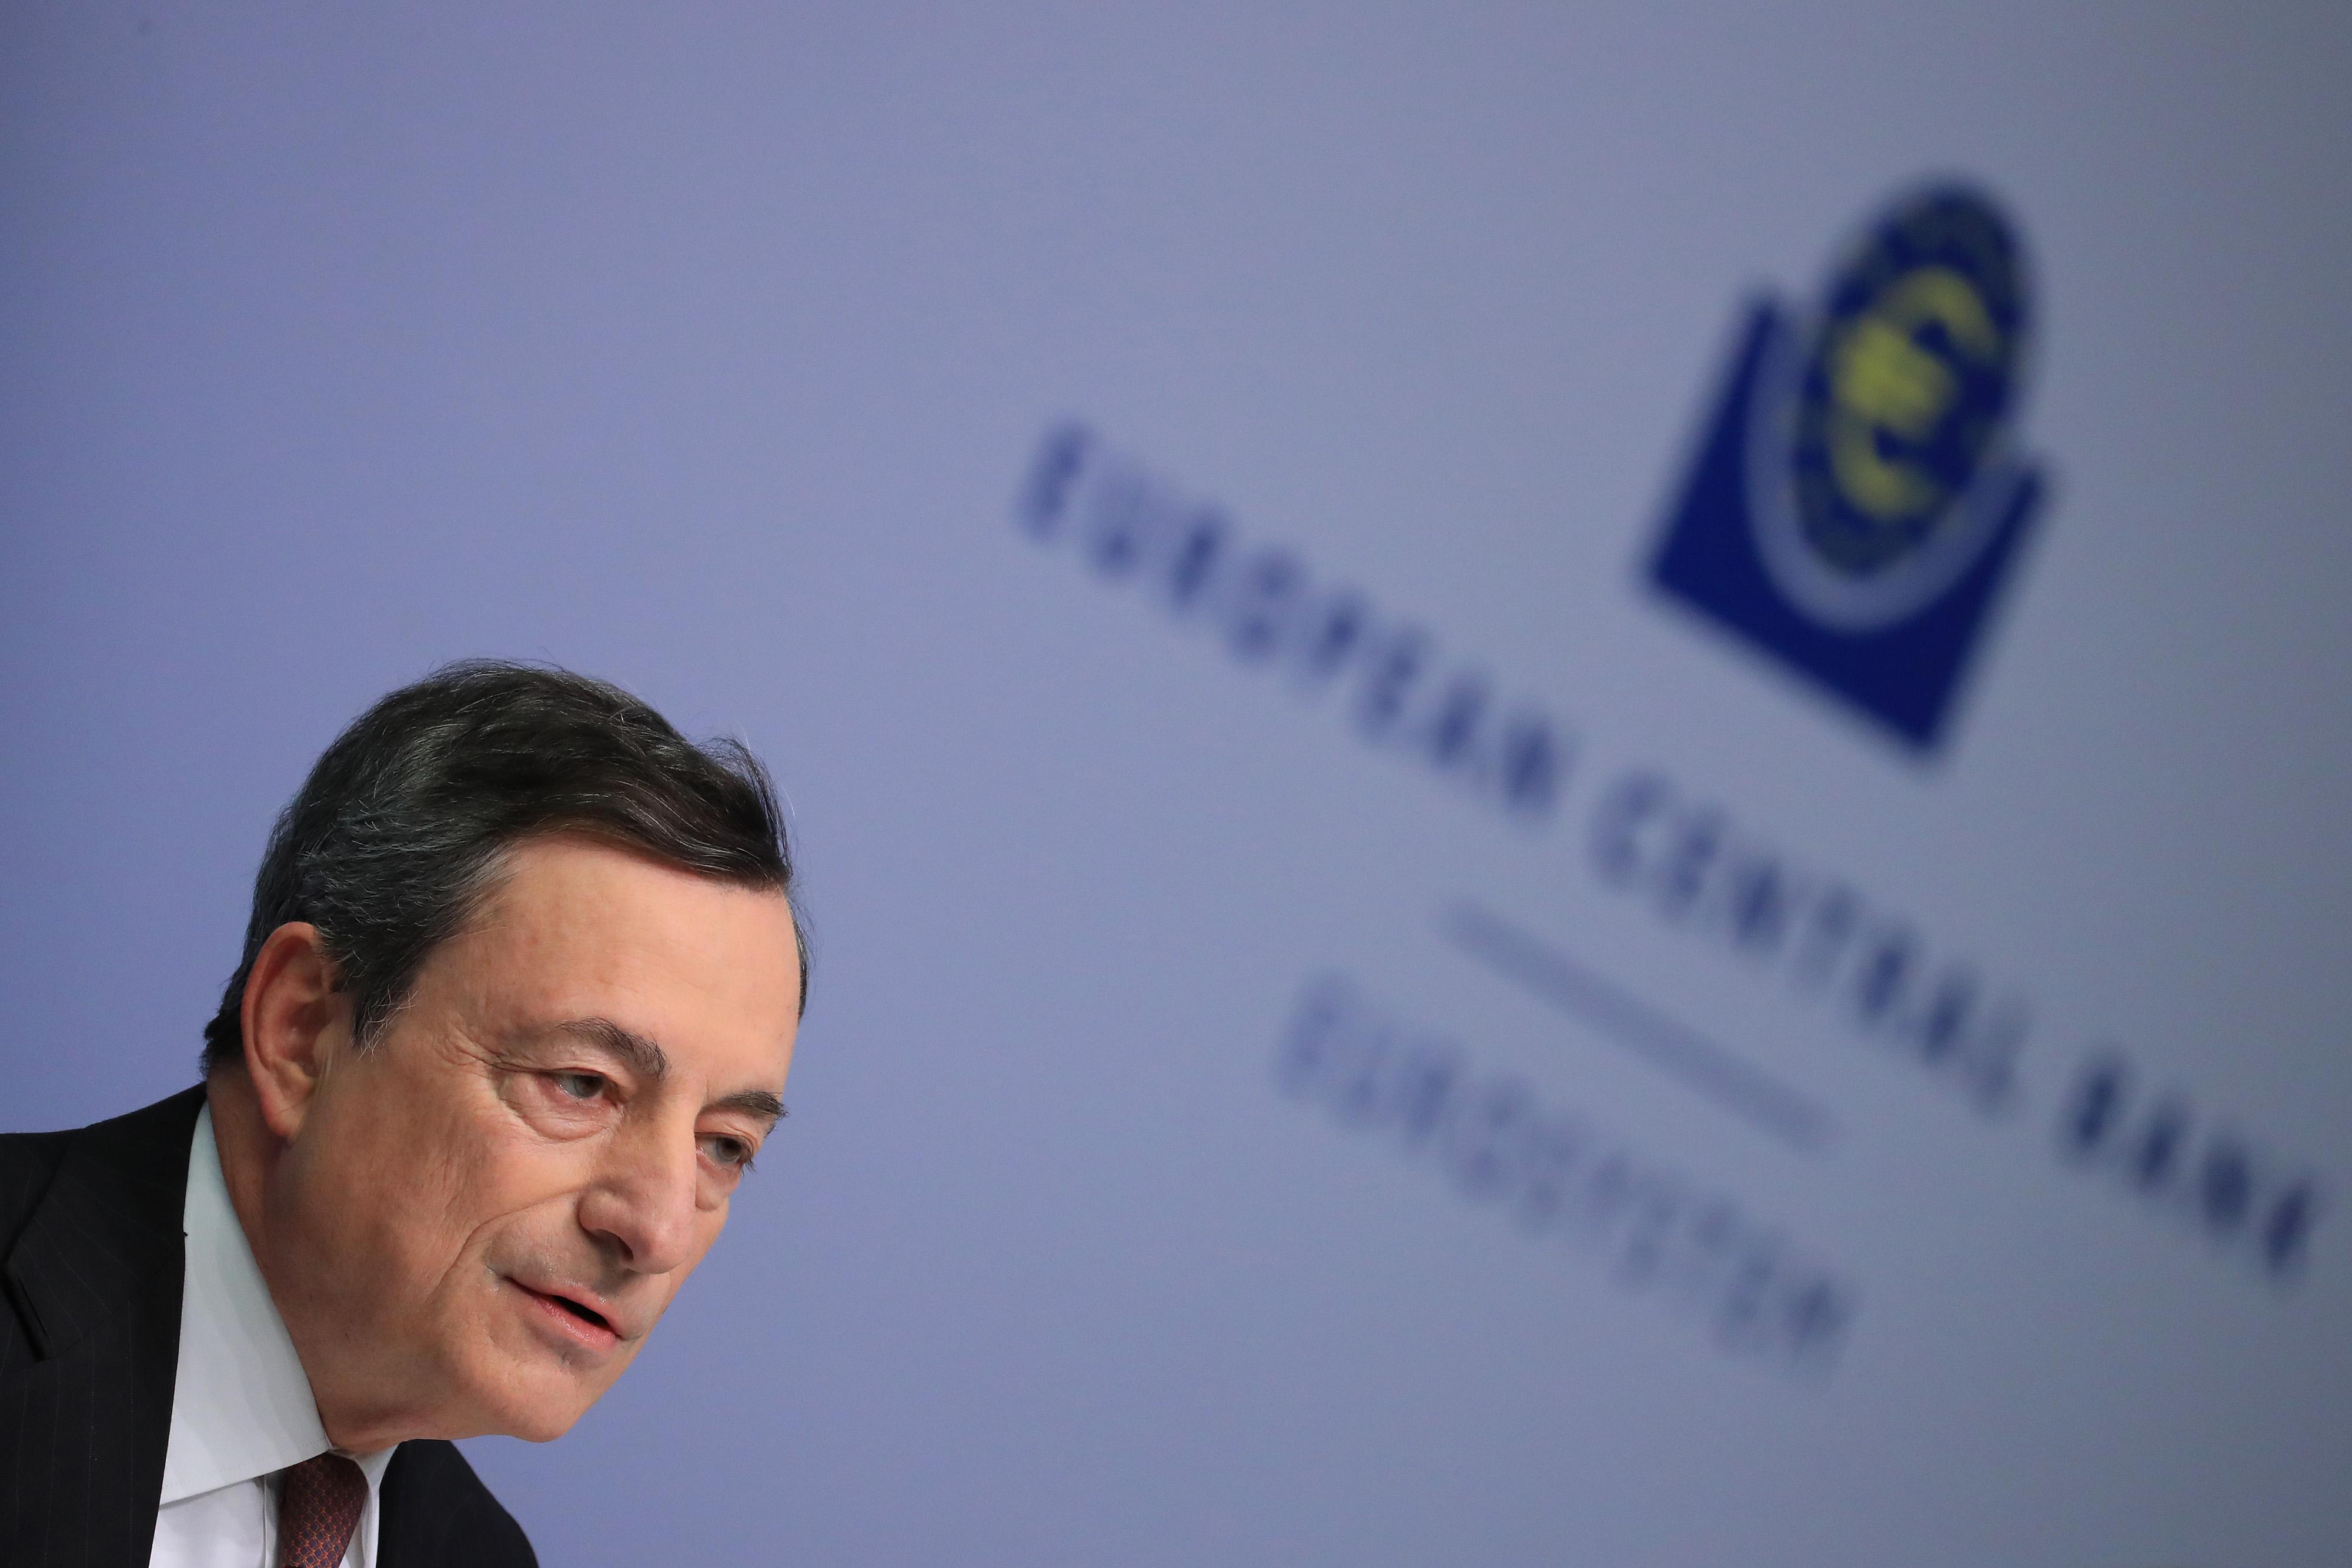 European Central Bank President Mario Draghi Announces Interest Rate Decision